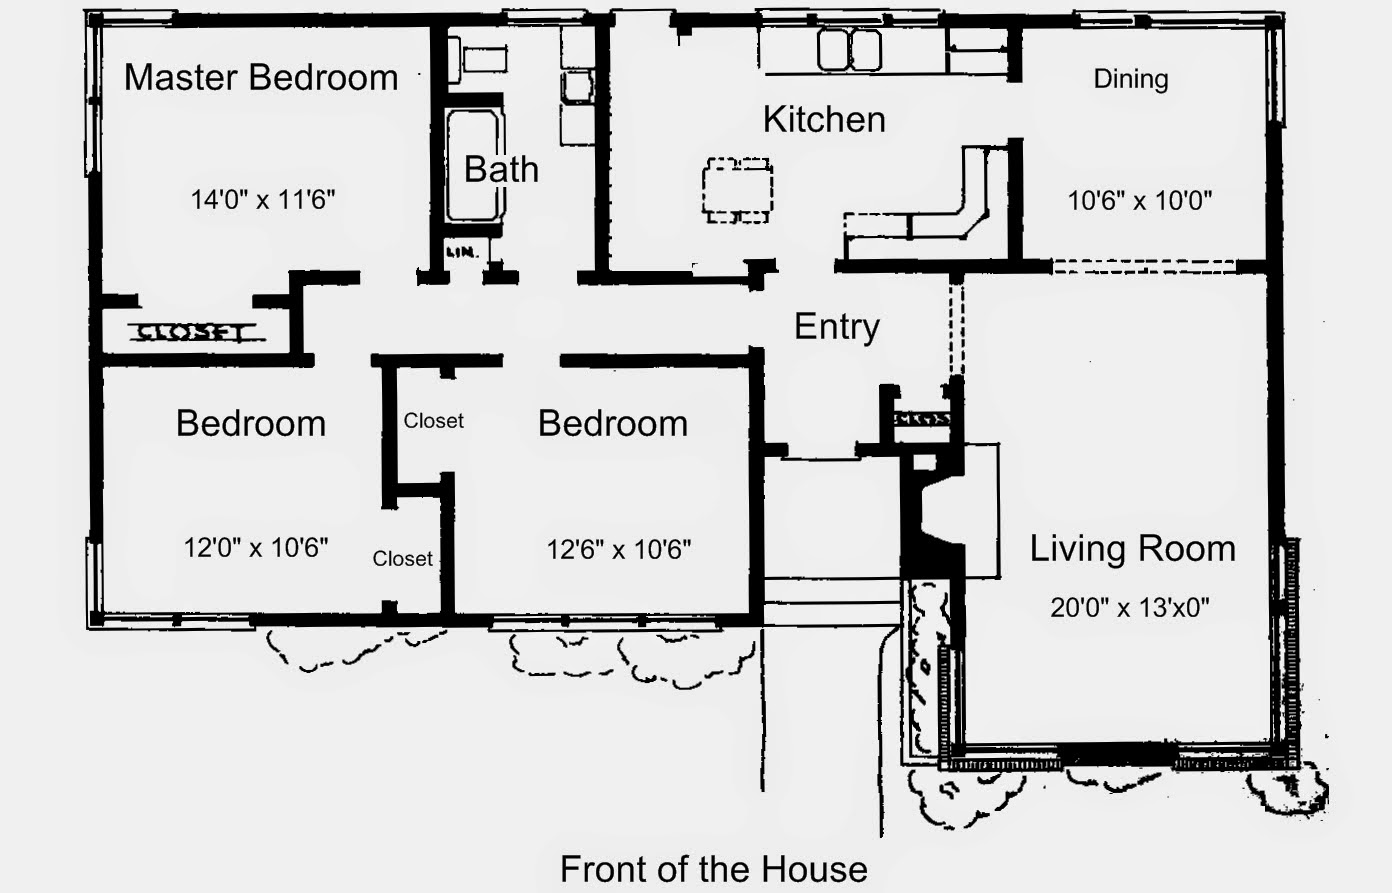 Gambar Denah Rumah Minimalis Sederhana 1 Lantai 3 Kamar Tidur Terbaru